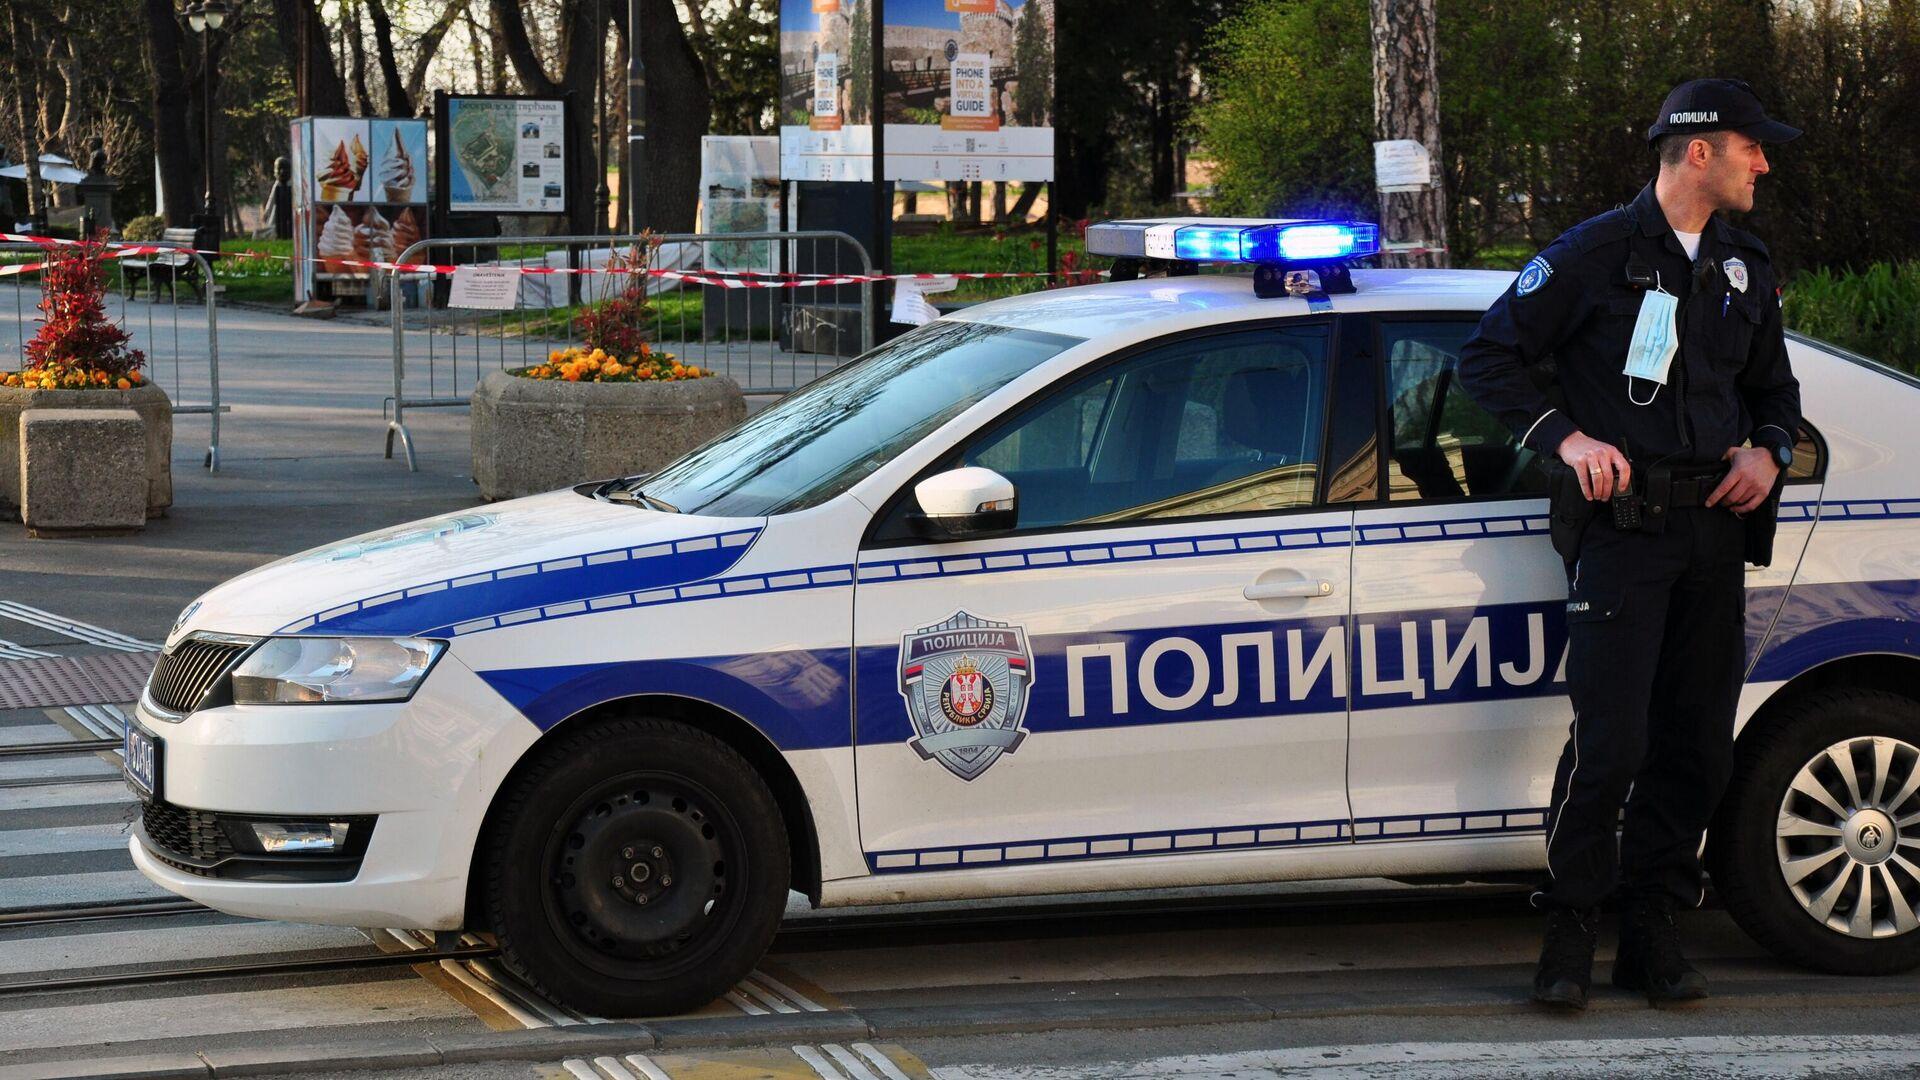 Сотрудники полиции на улицах Белграда во время комендантского часа - РИА Новости, 1920, 04.01.2021